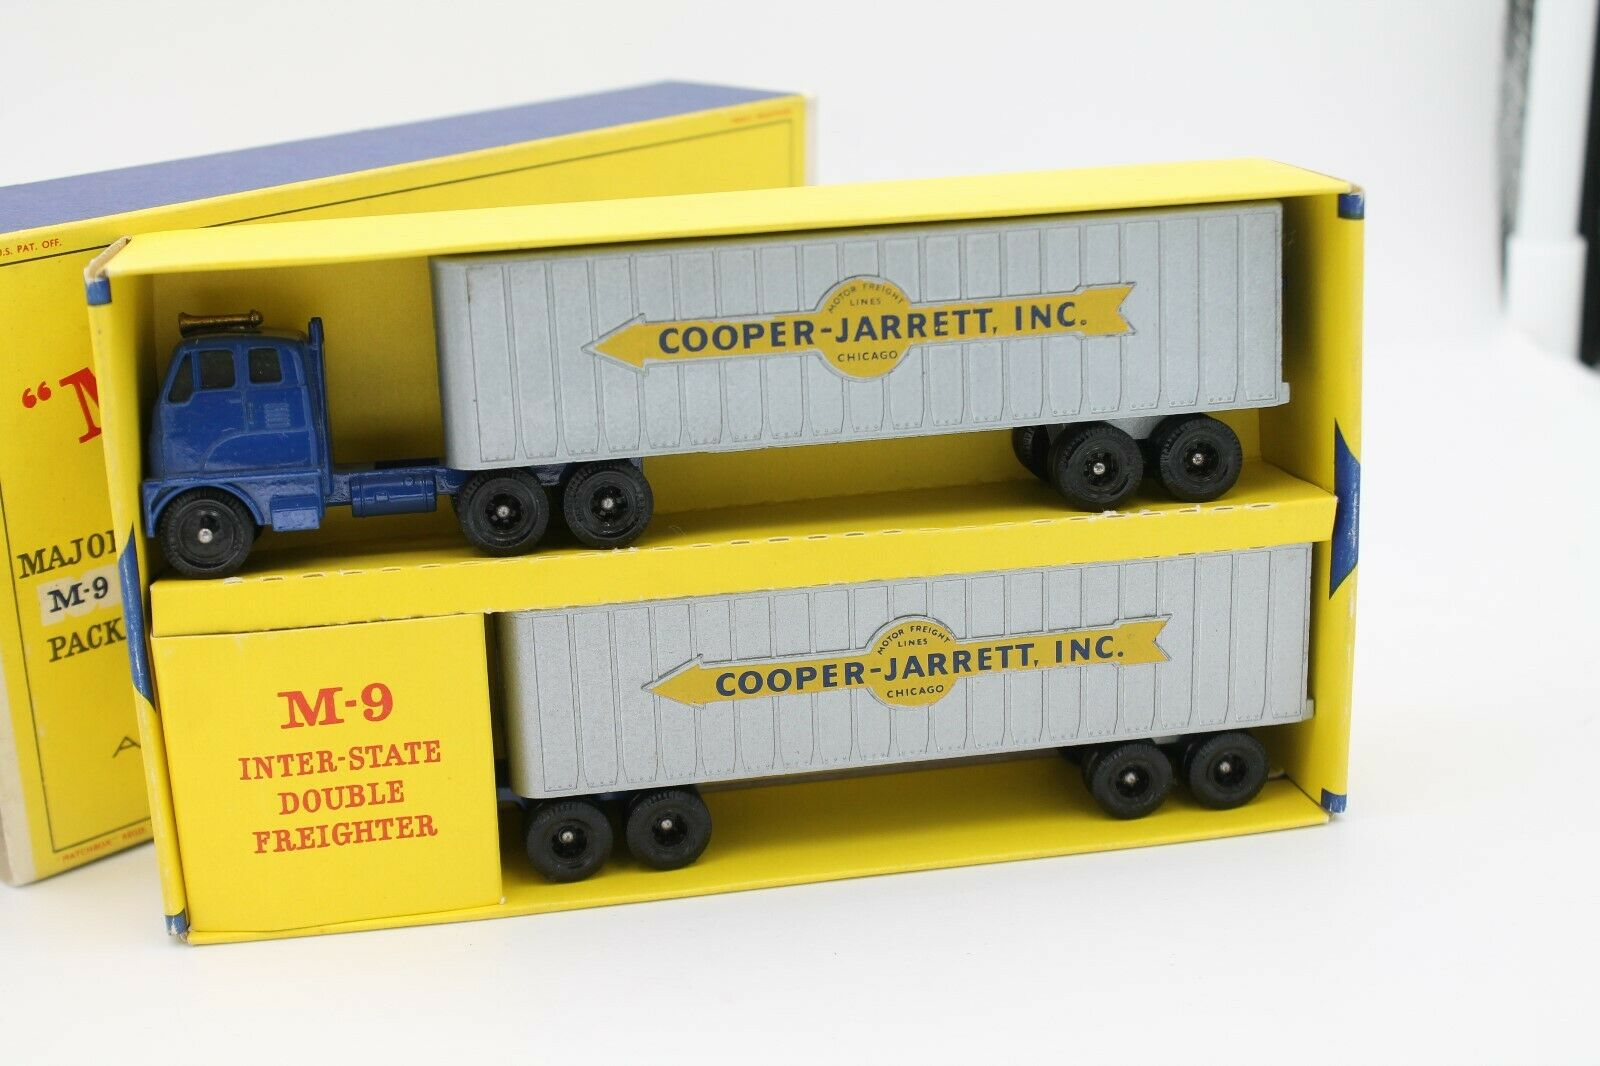 MATCHBOX SERIES M-9  INTER-STATE DOUBLE FREIGHTER  COOPER-JARRETT  OVP